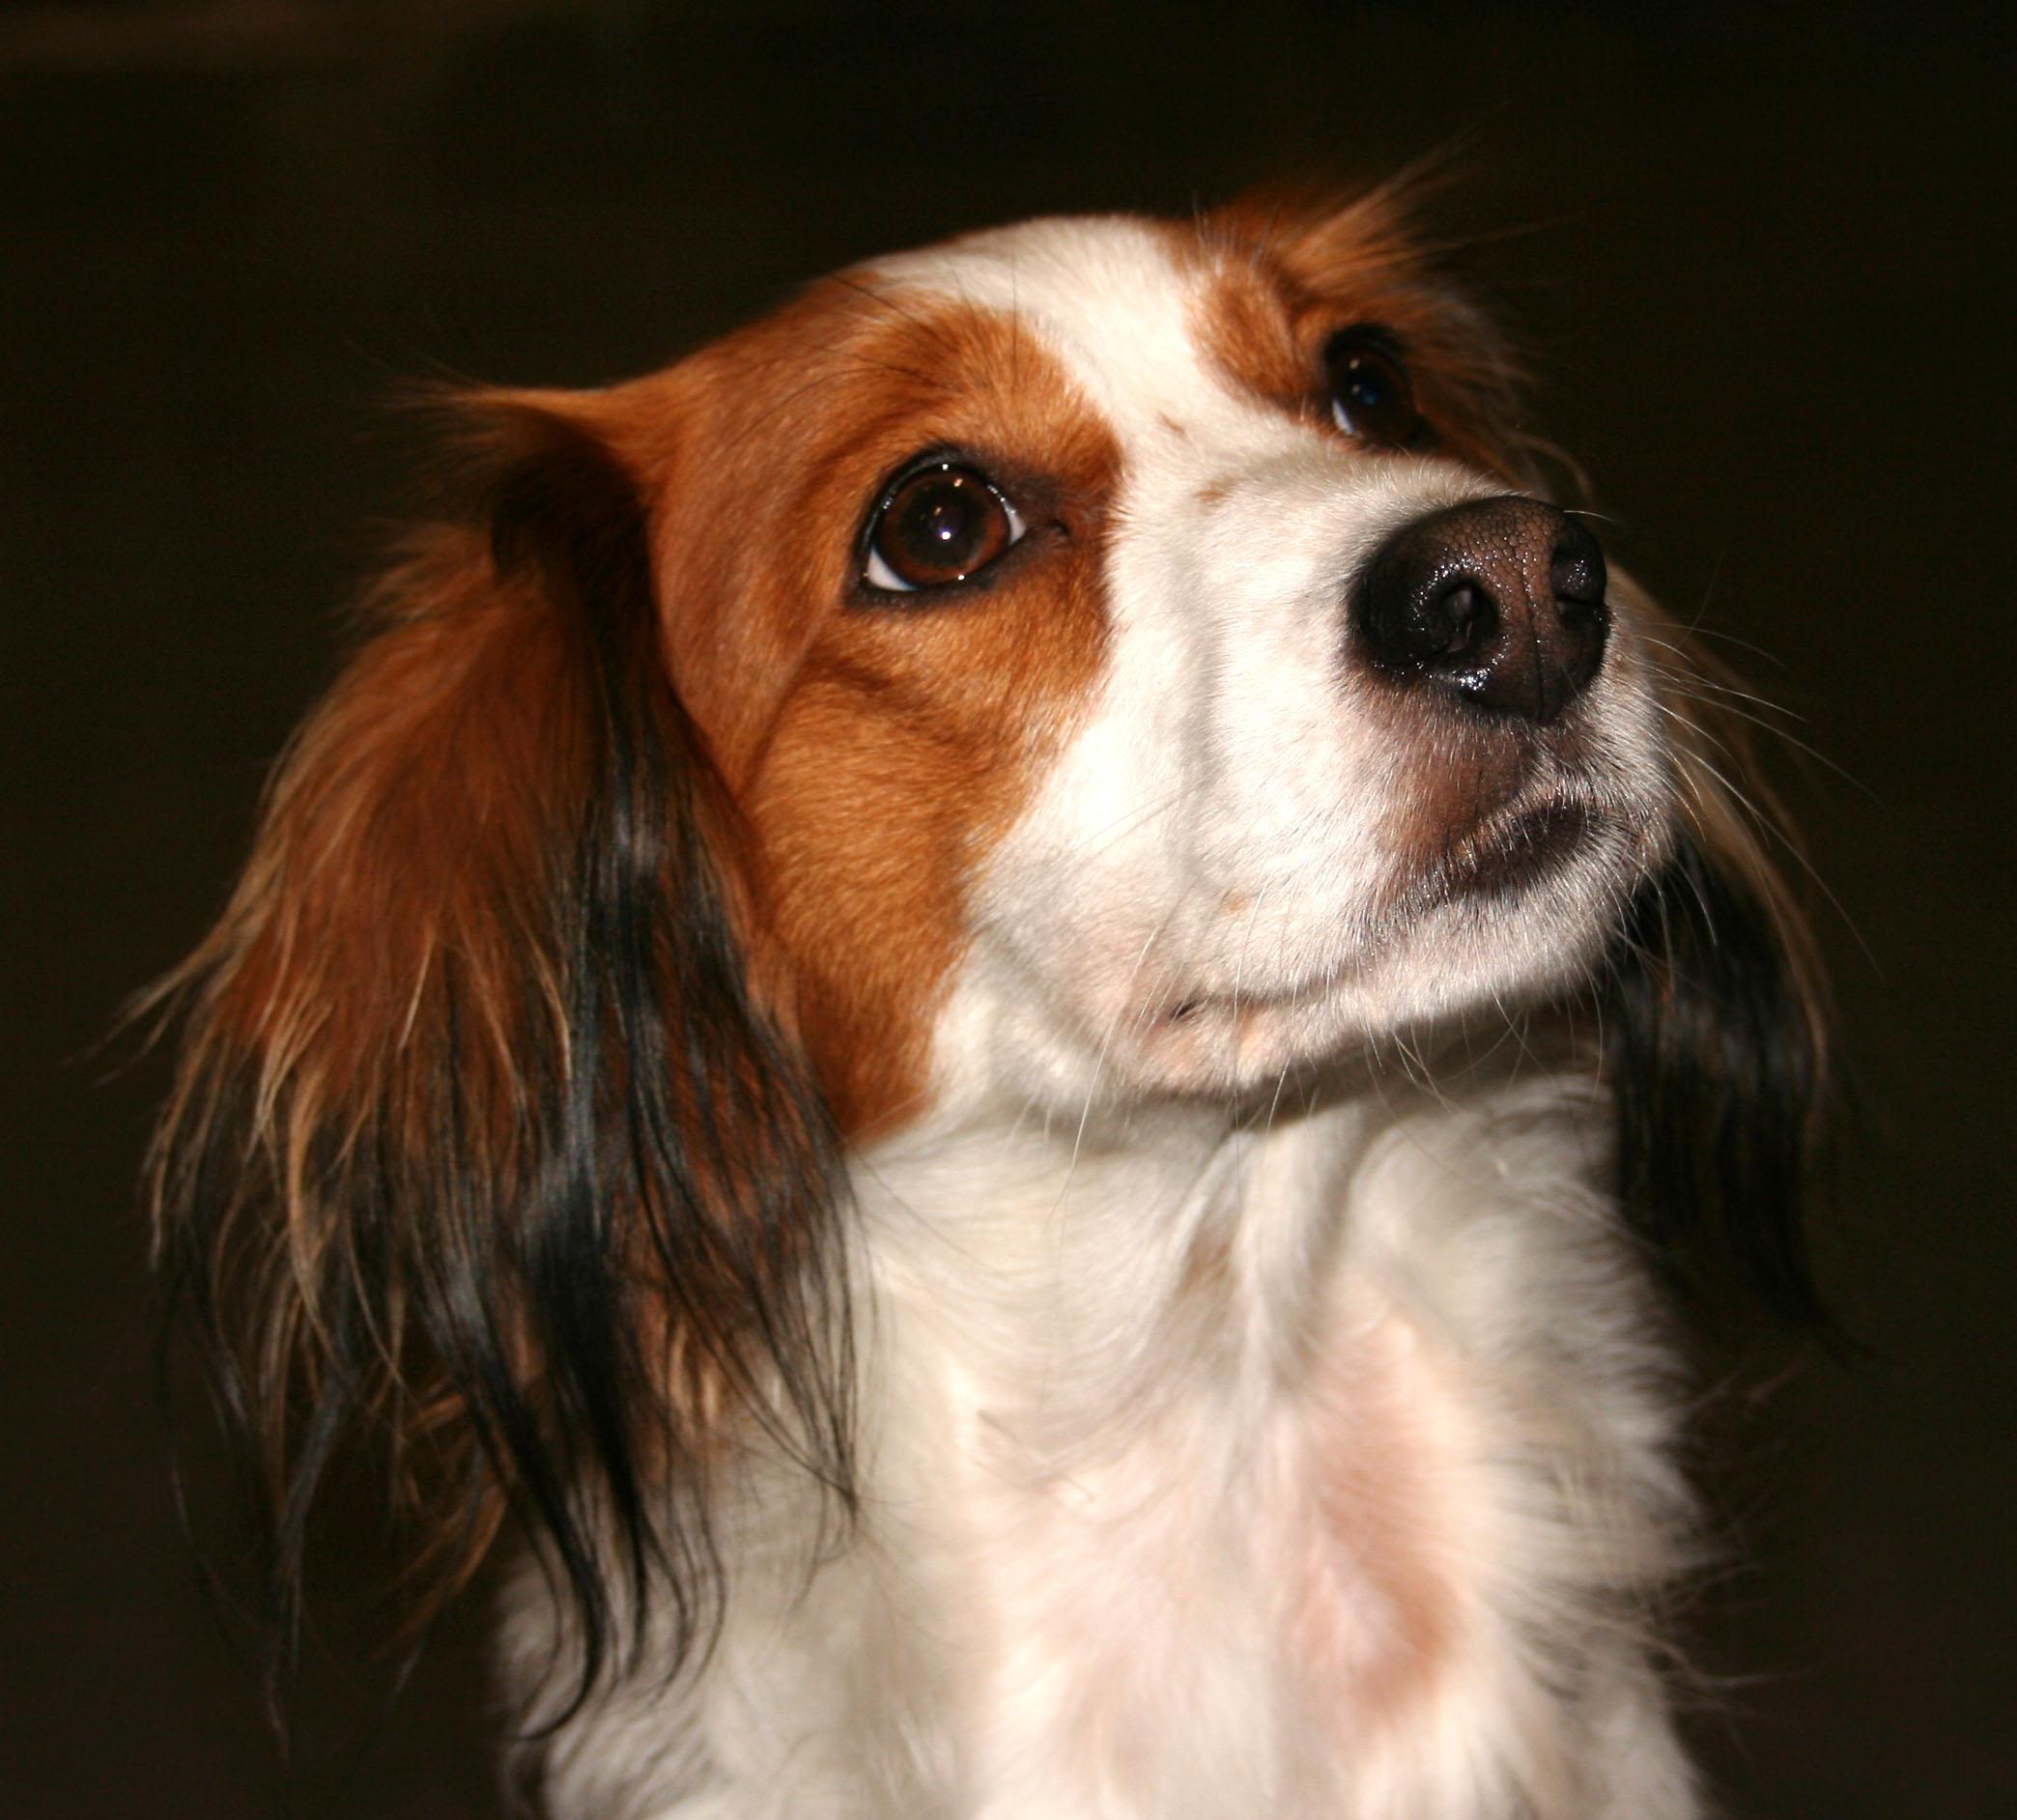 Cute N Lovely Wallpapers Lovely Kooikerhondje Dog Photo And Wallpaper Beautiful